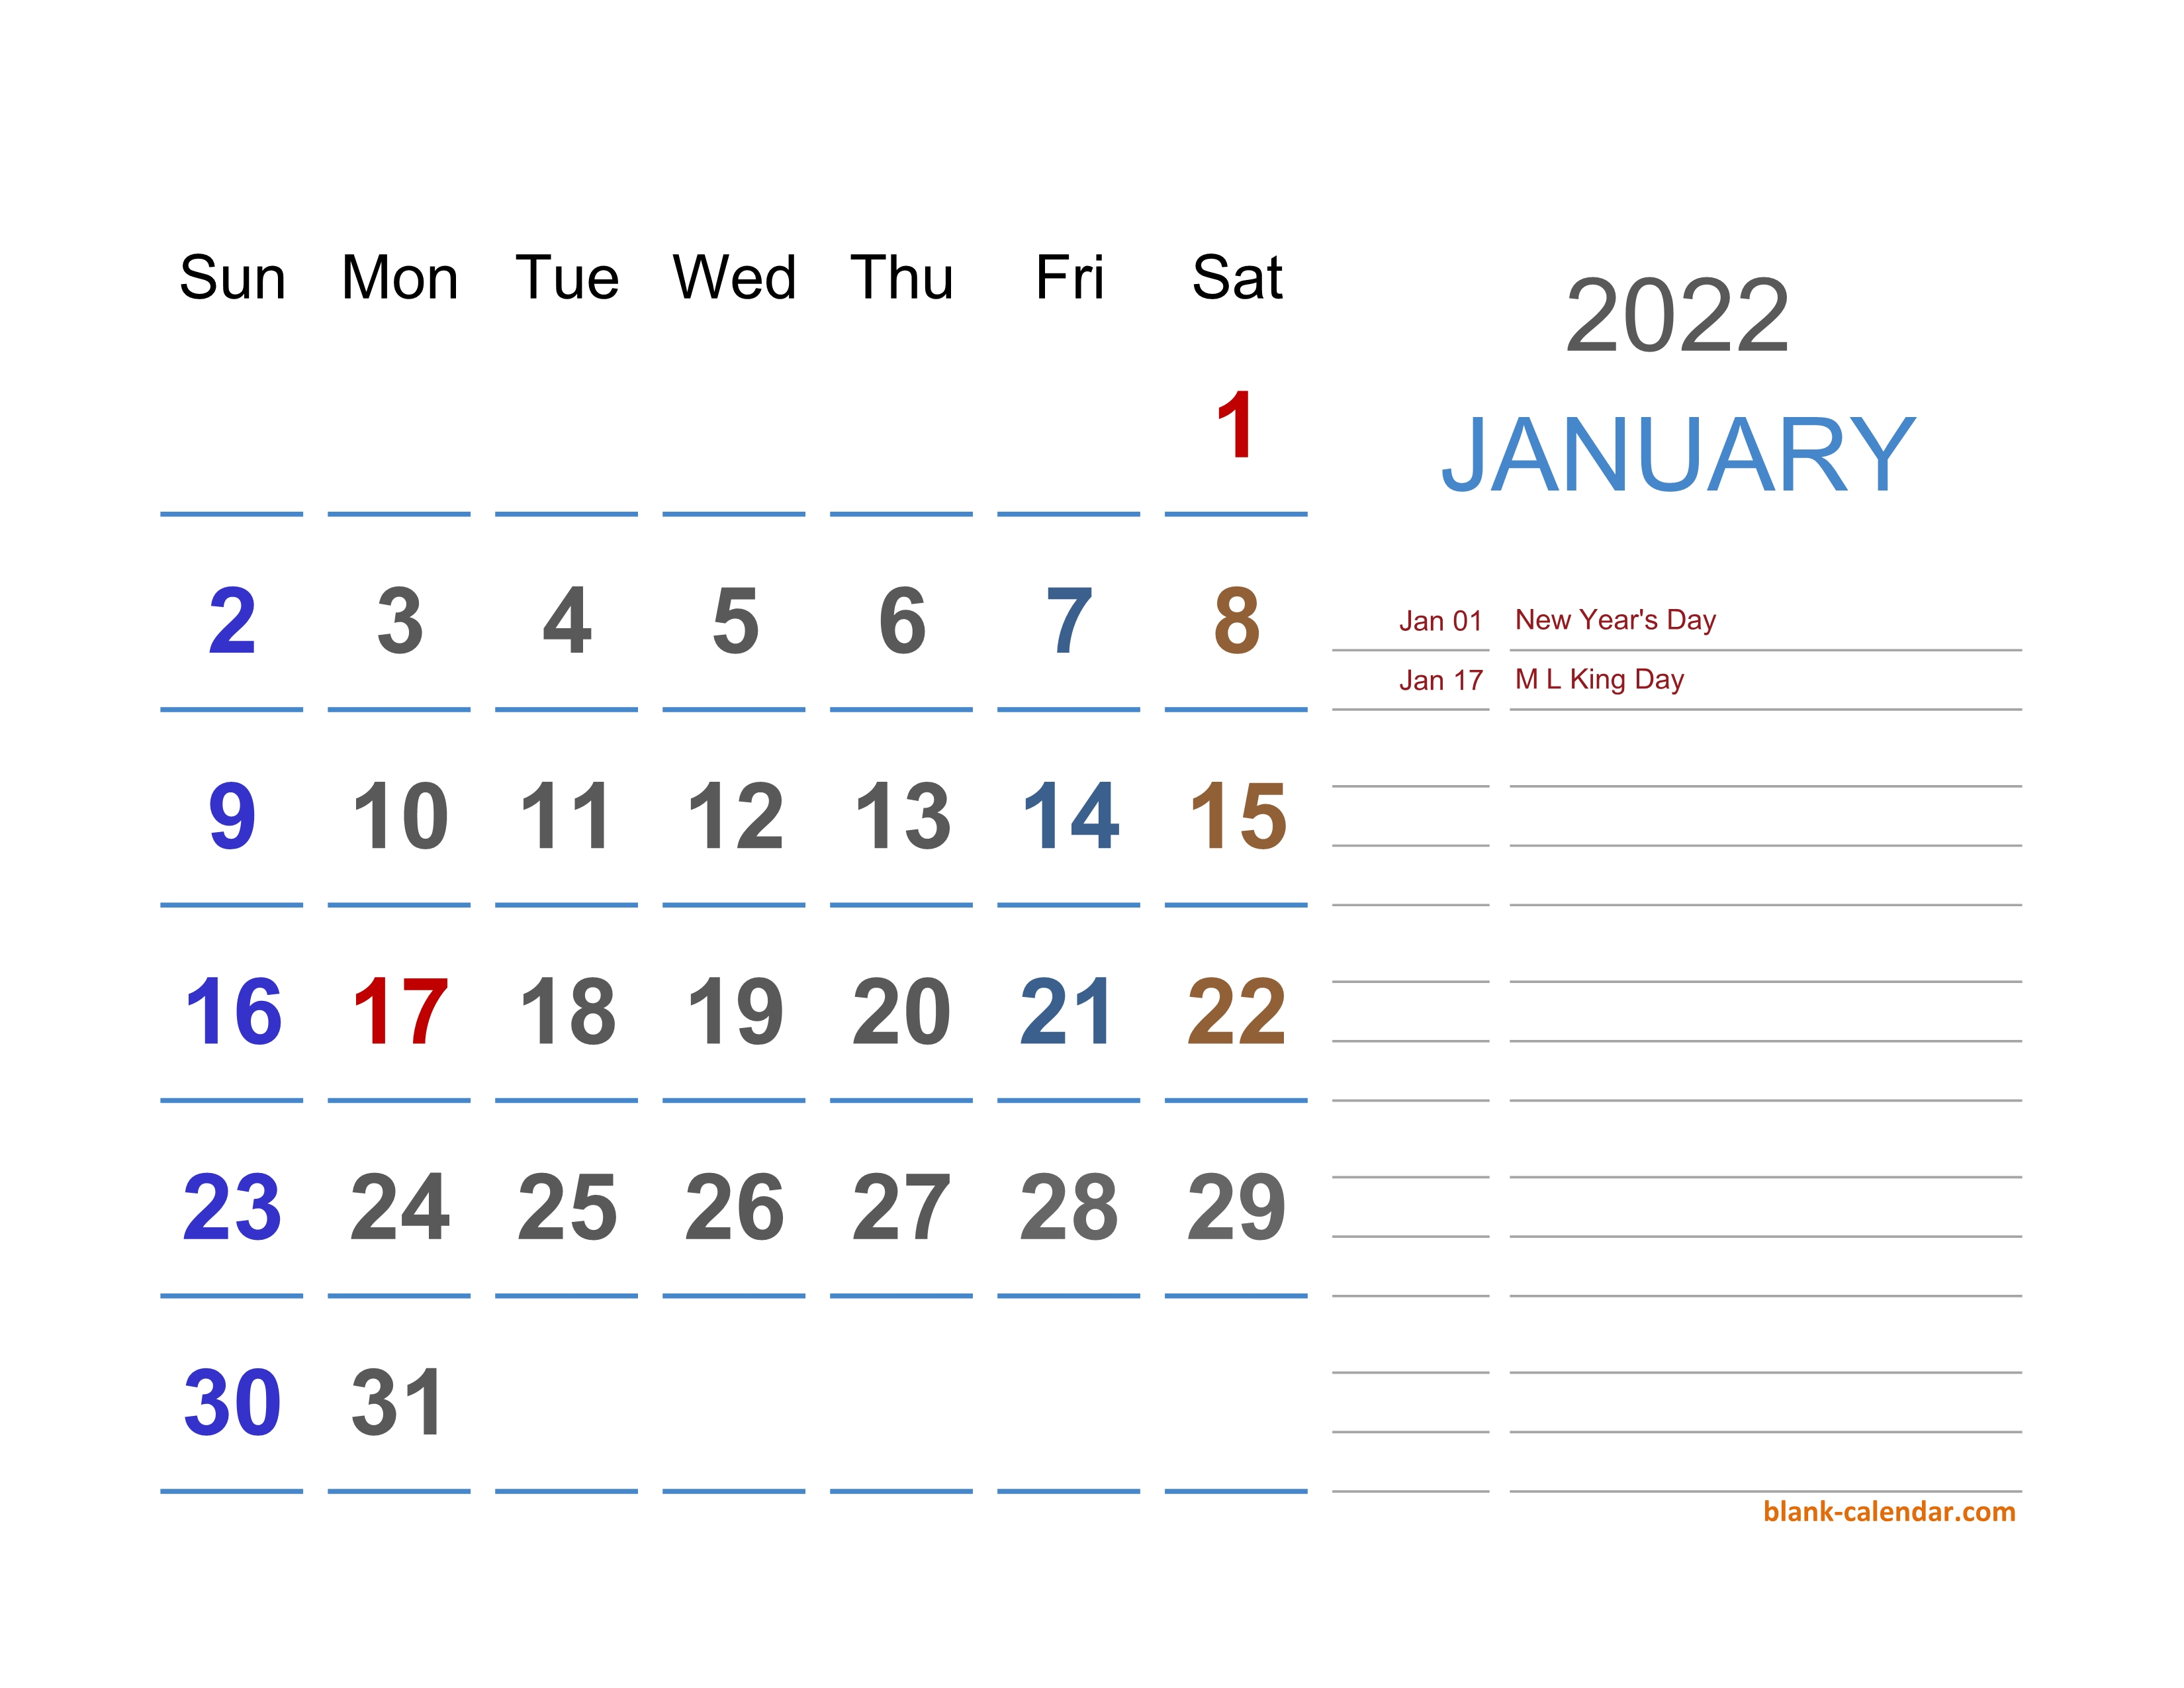 2022 Excel Calendar.2022 Excel Calendar Free Download Excel Calendar Templates